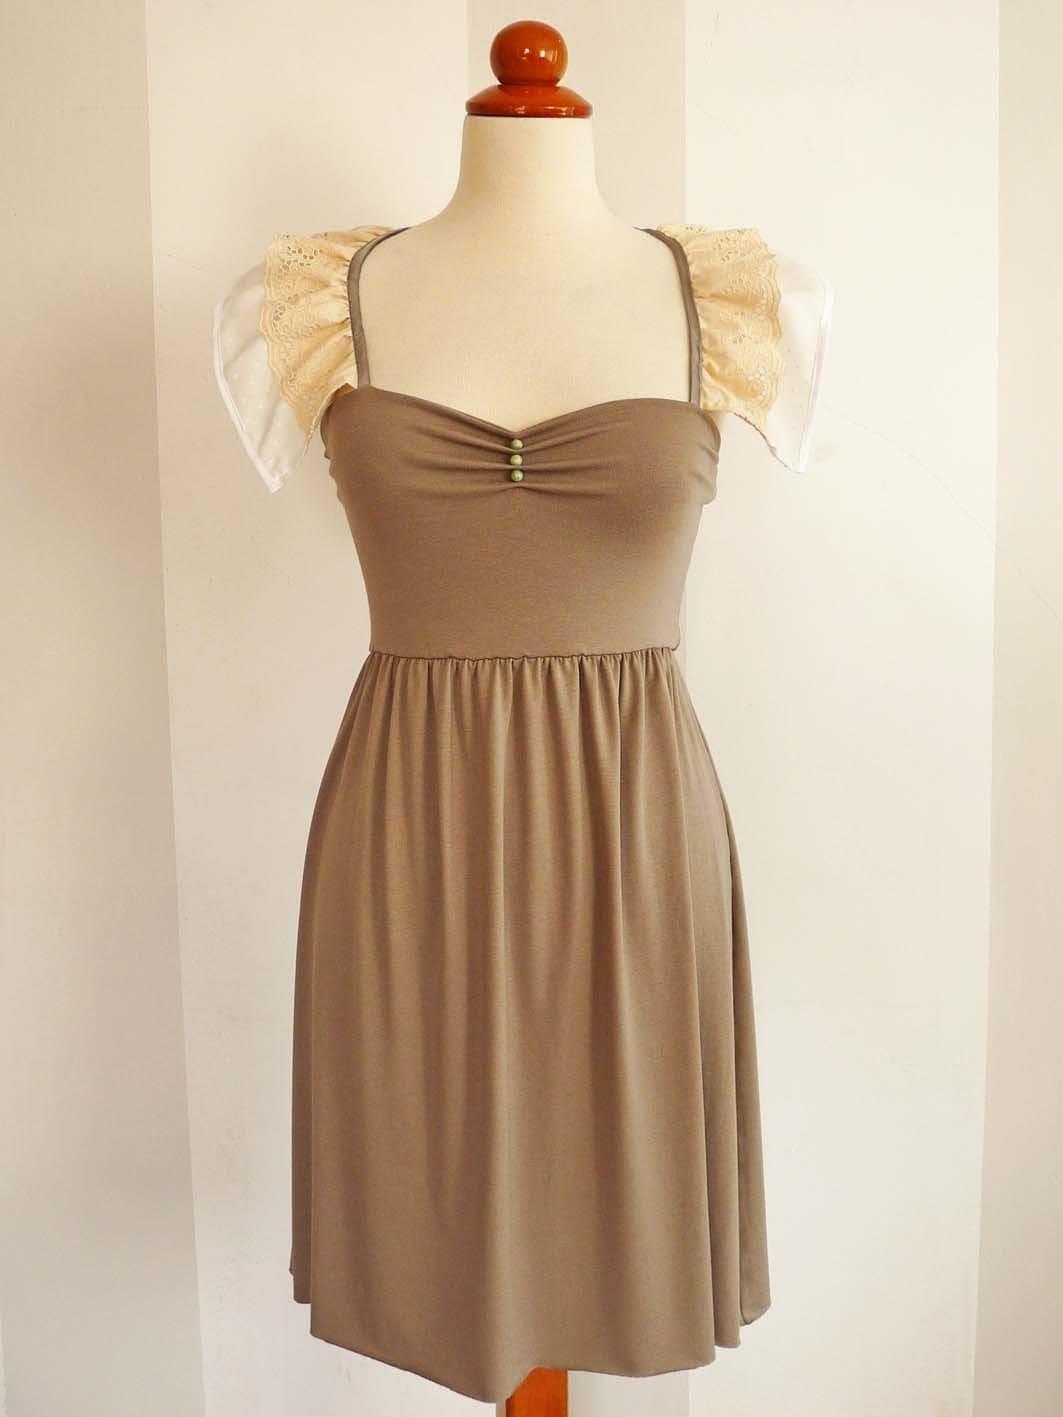 Soft Beige Dress